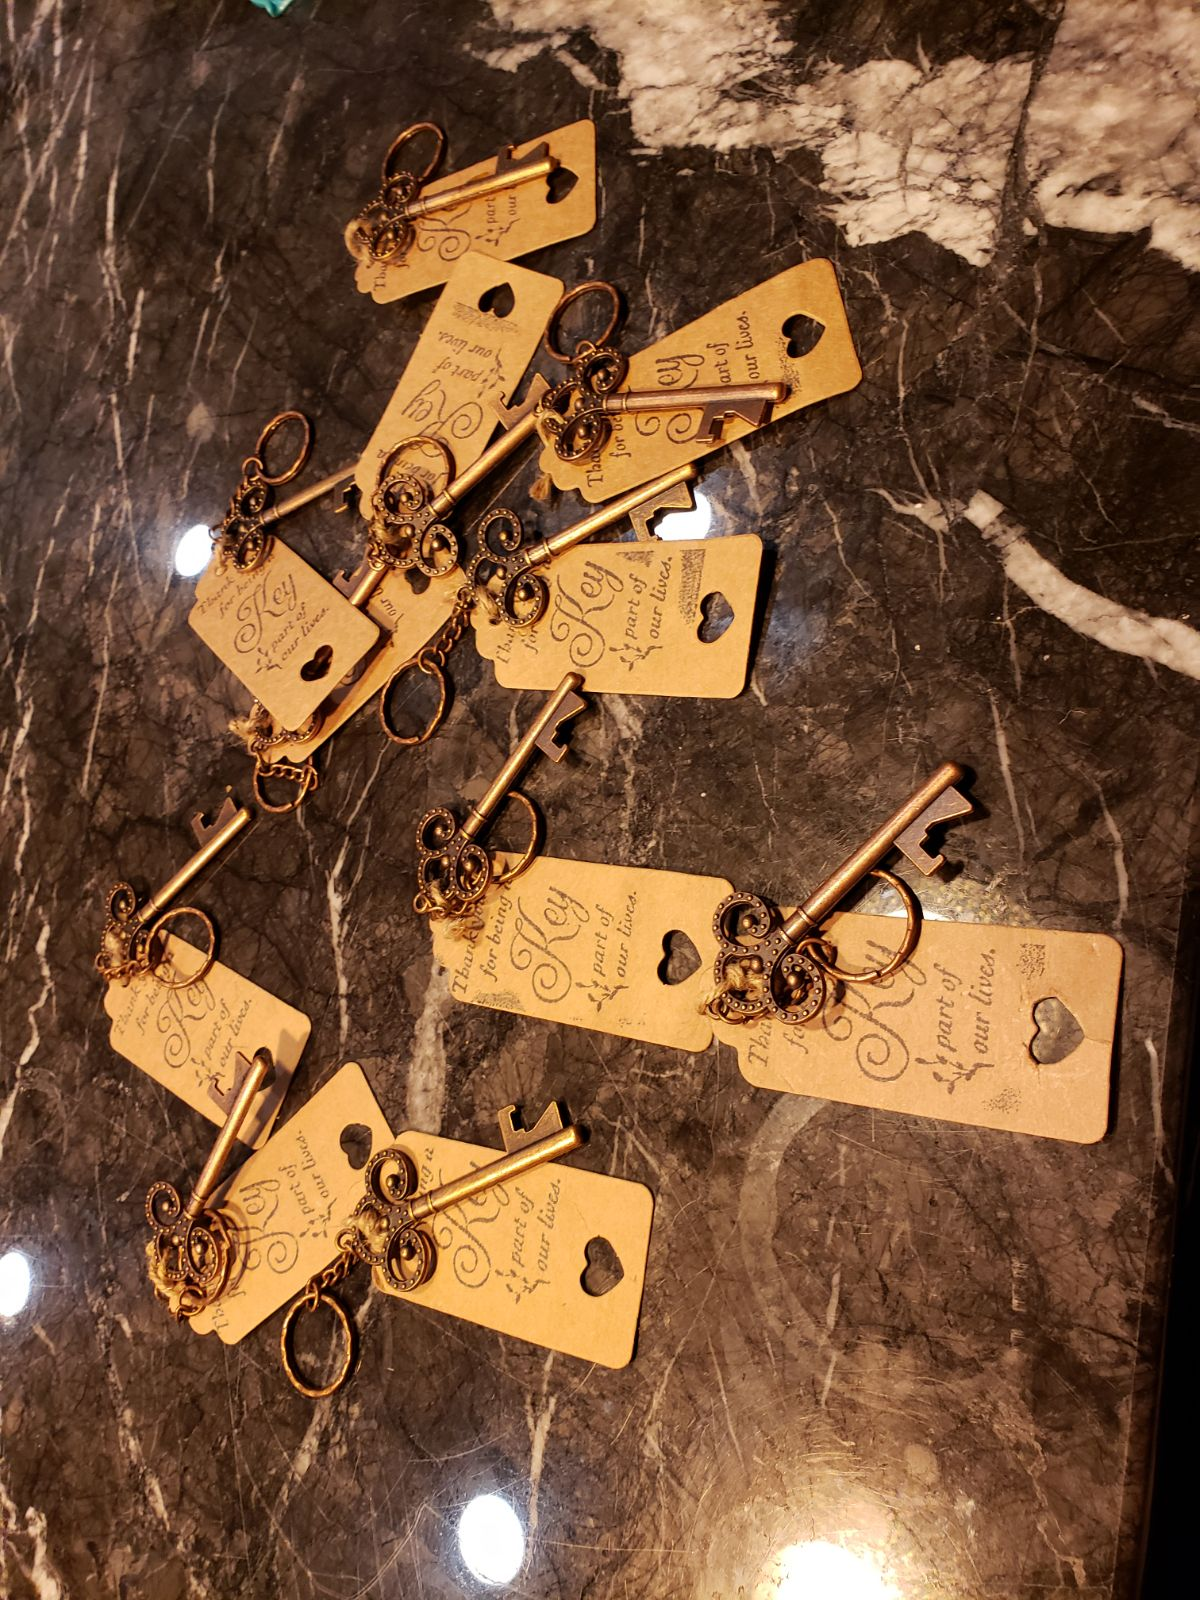 11 Key chain favors